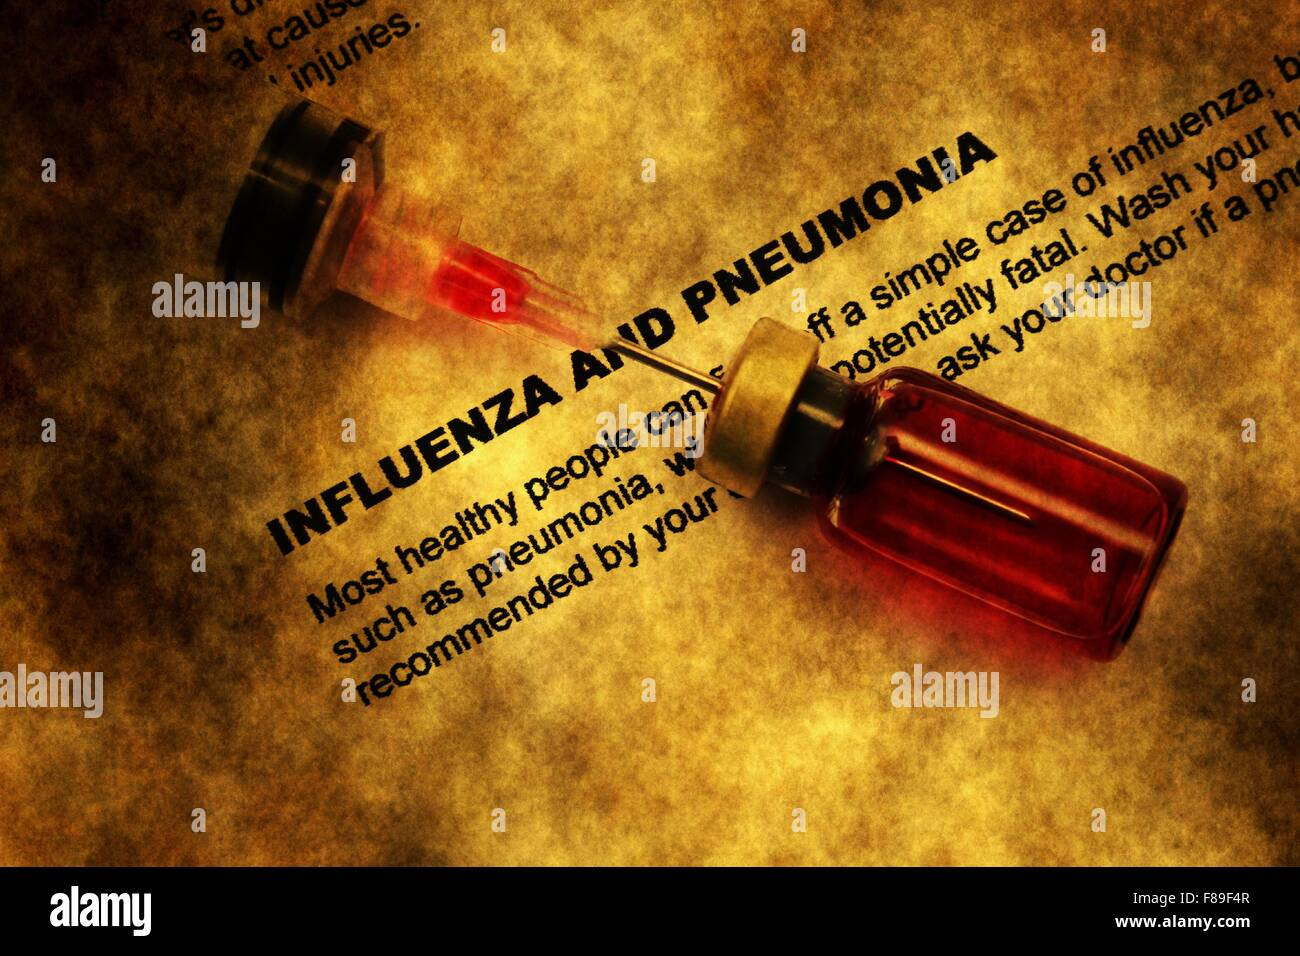 Influenza and pneumonia grunge concept - Stock Image